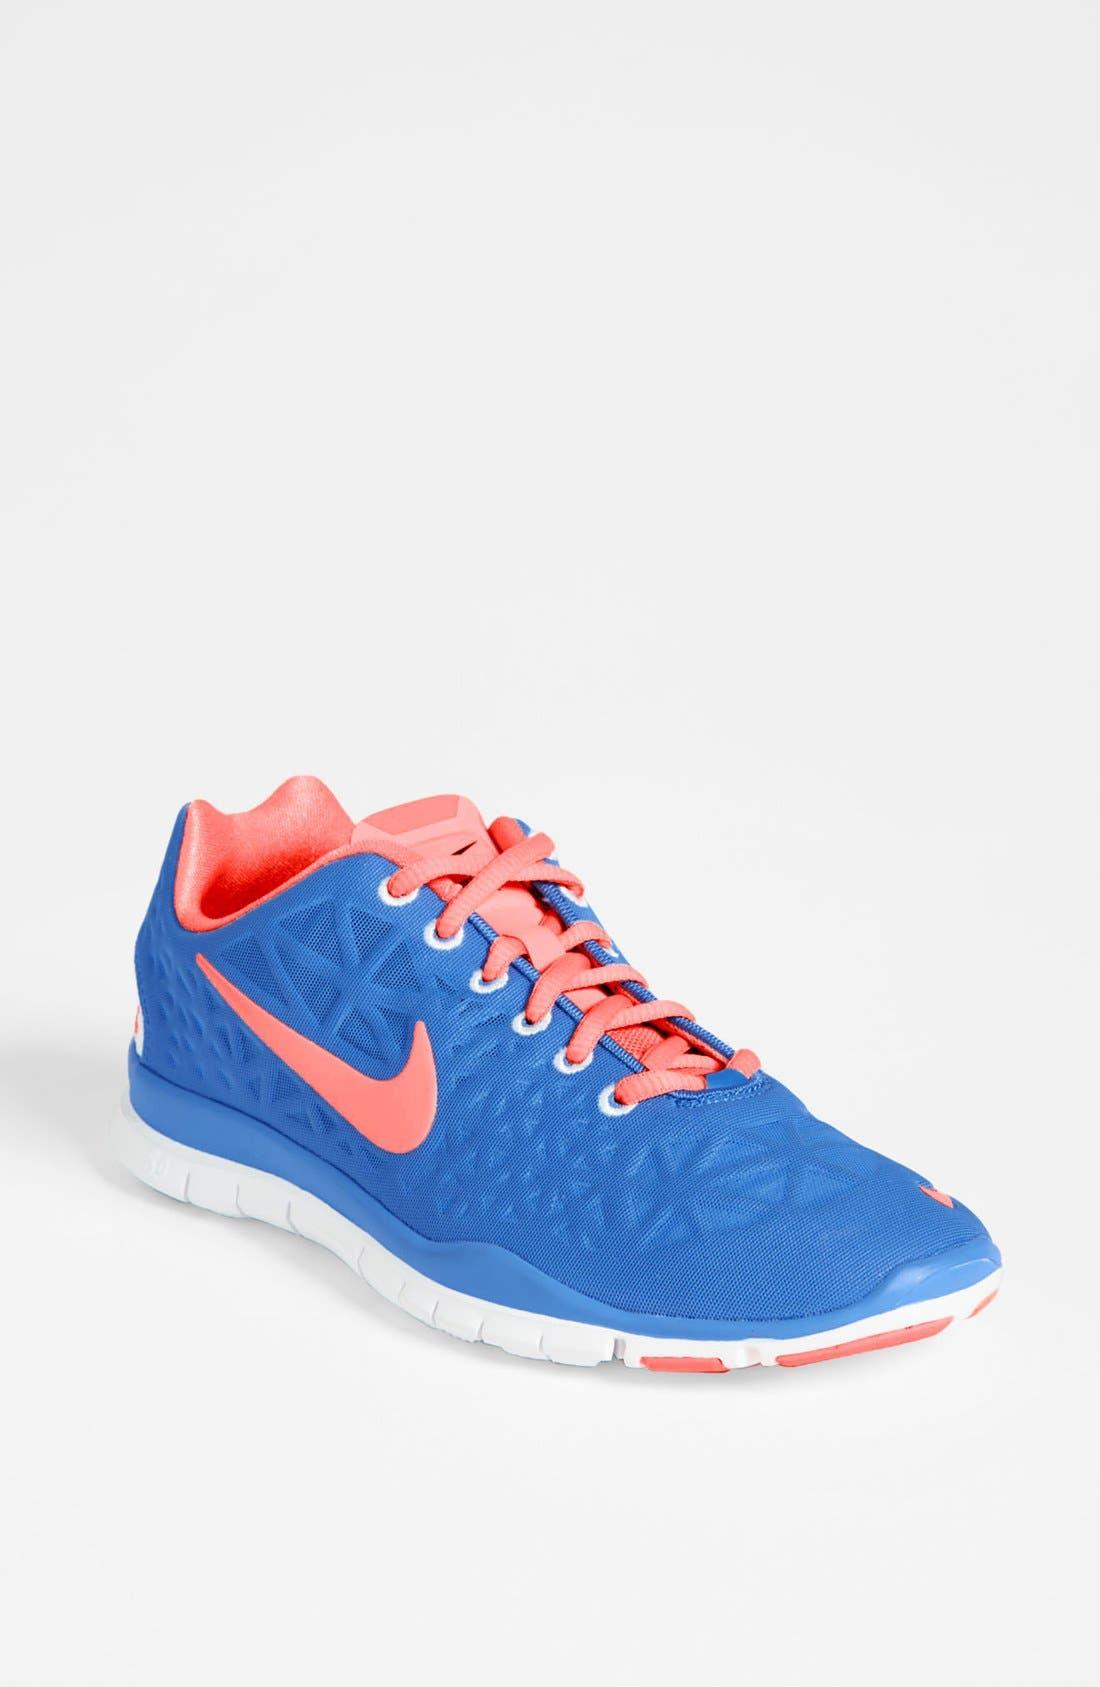 Main Image - Nike 'Free TR Fit 3' Training Shoe (Women)